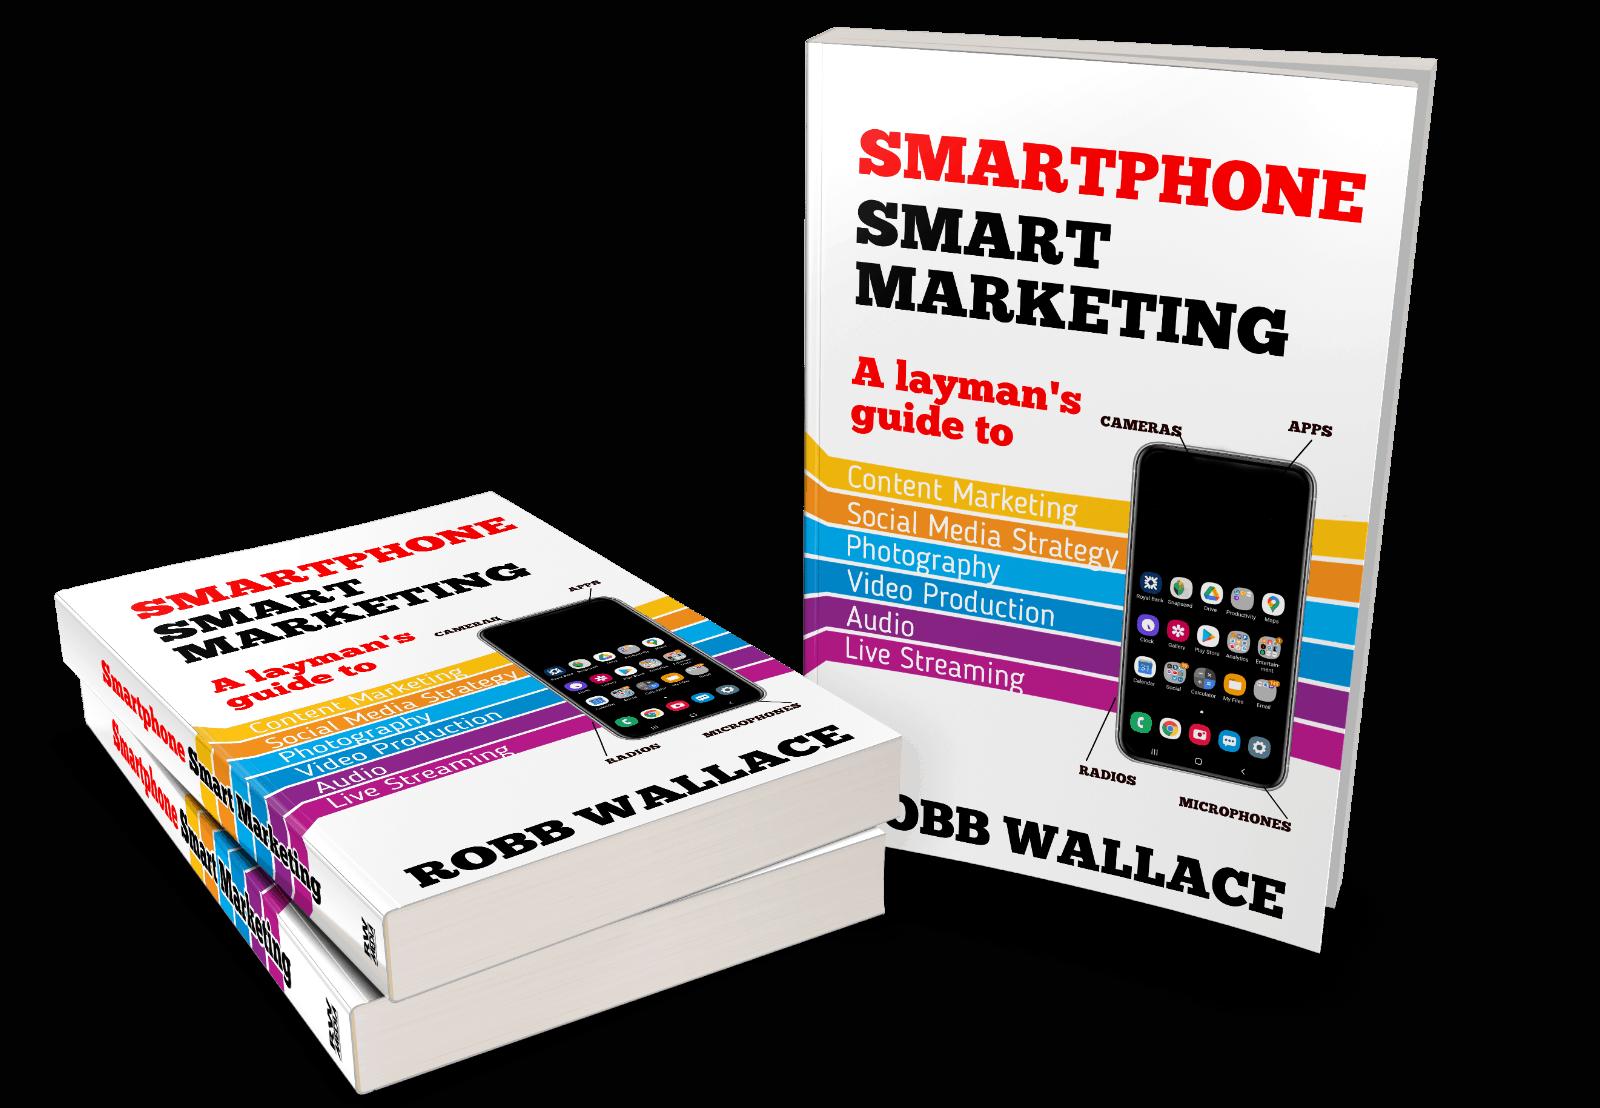 Smartphone-smart-marketing-web1